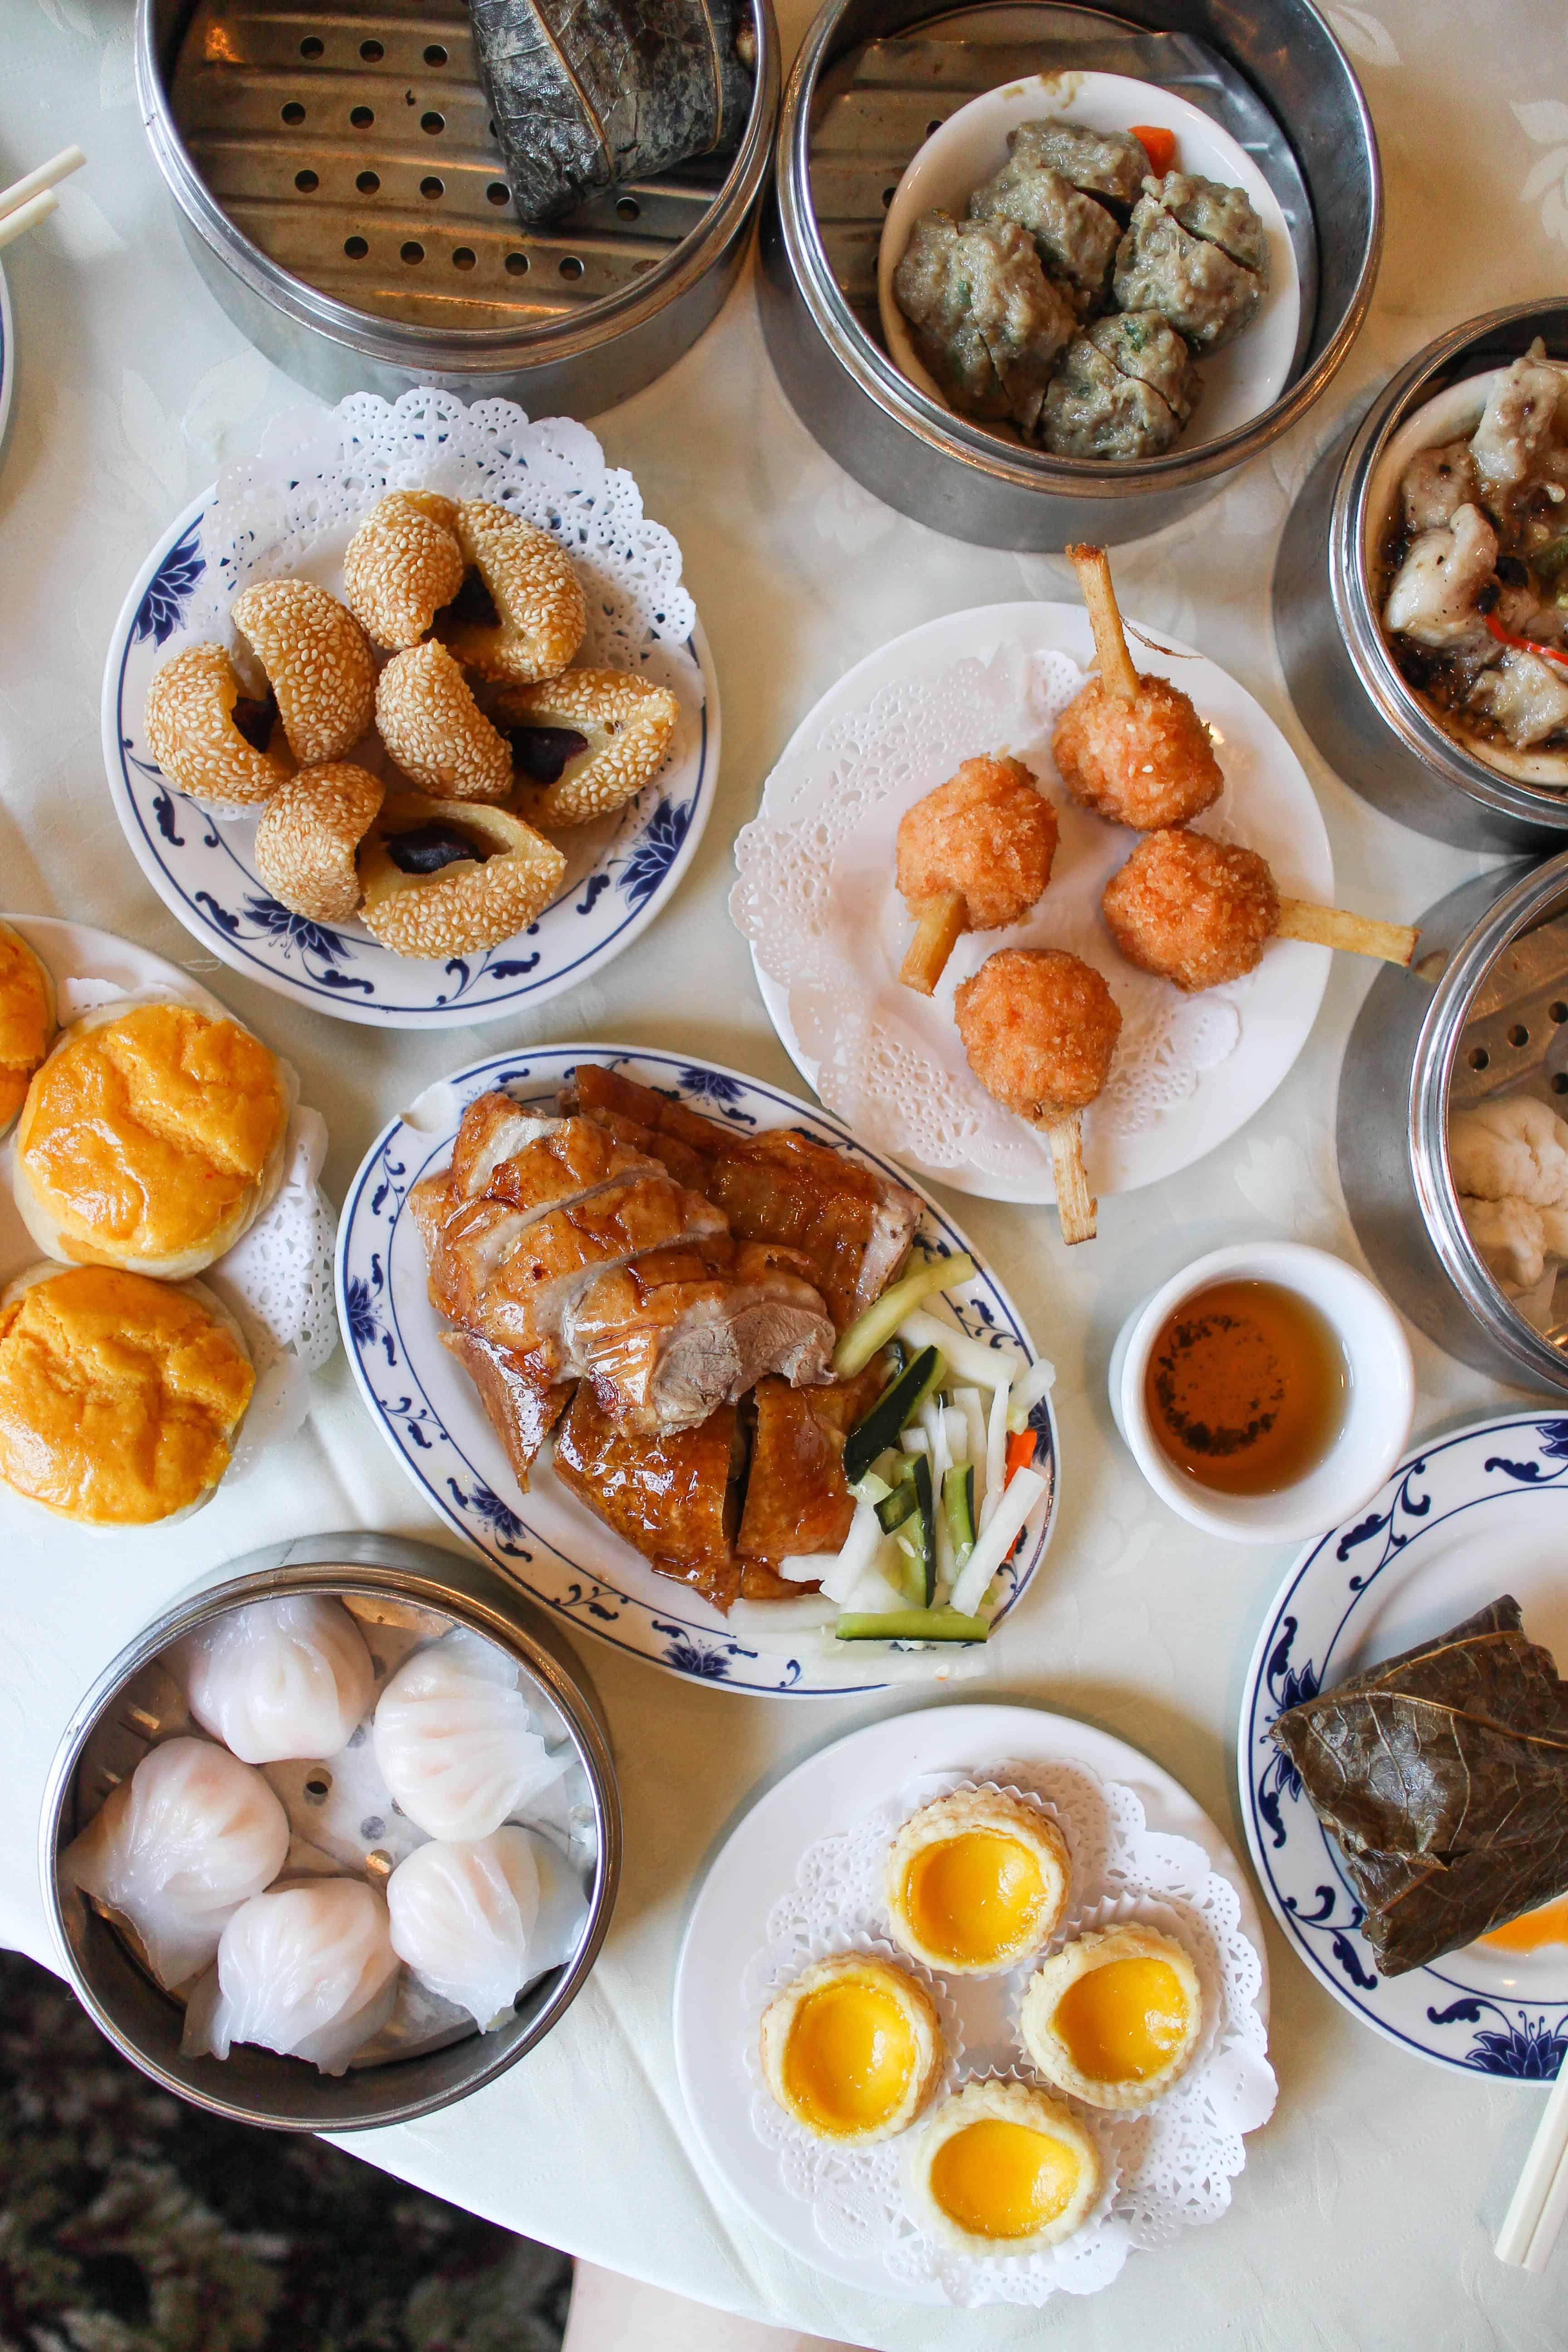 Chinese Chinese Food South Milwaukee